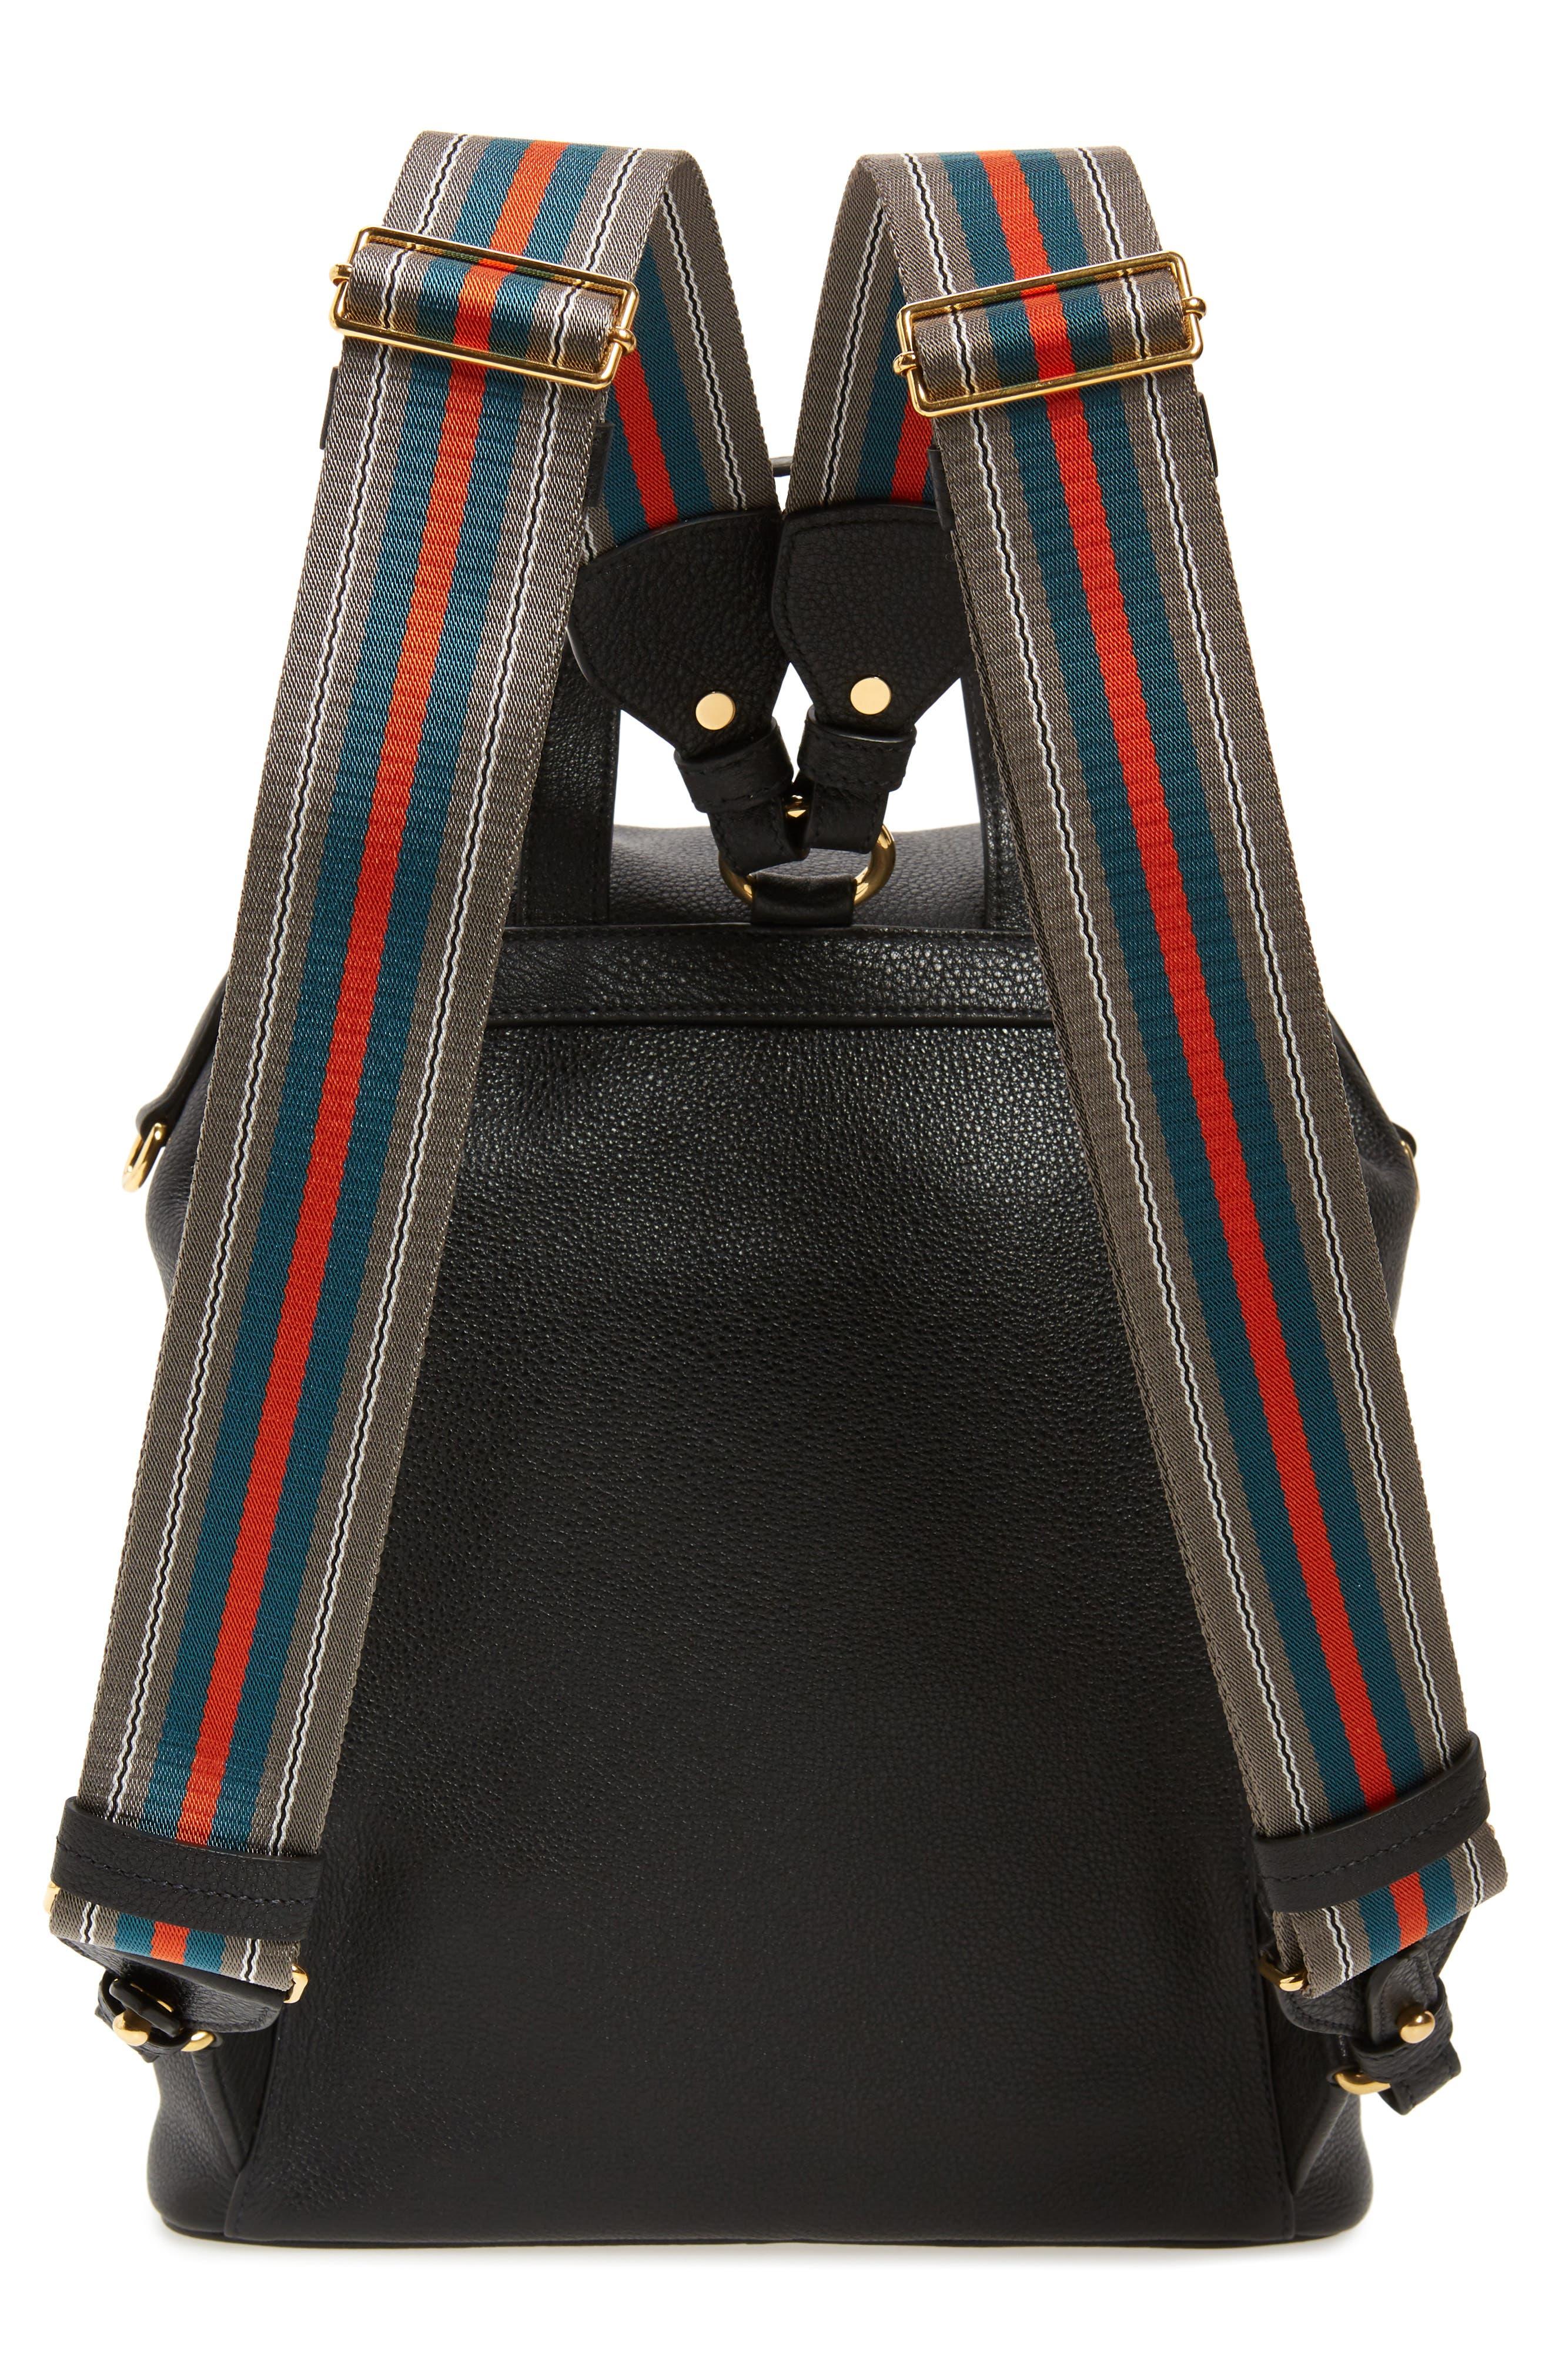 PRADA, Vitello Daino Pebbled Leather Backpack, Alternate thumbnail 4, color, 001